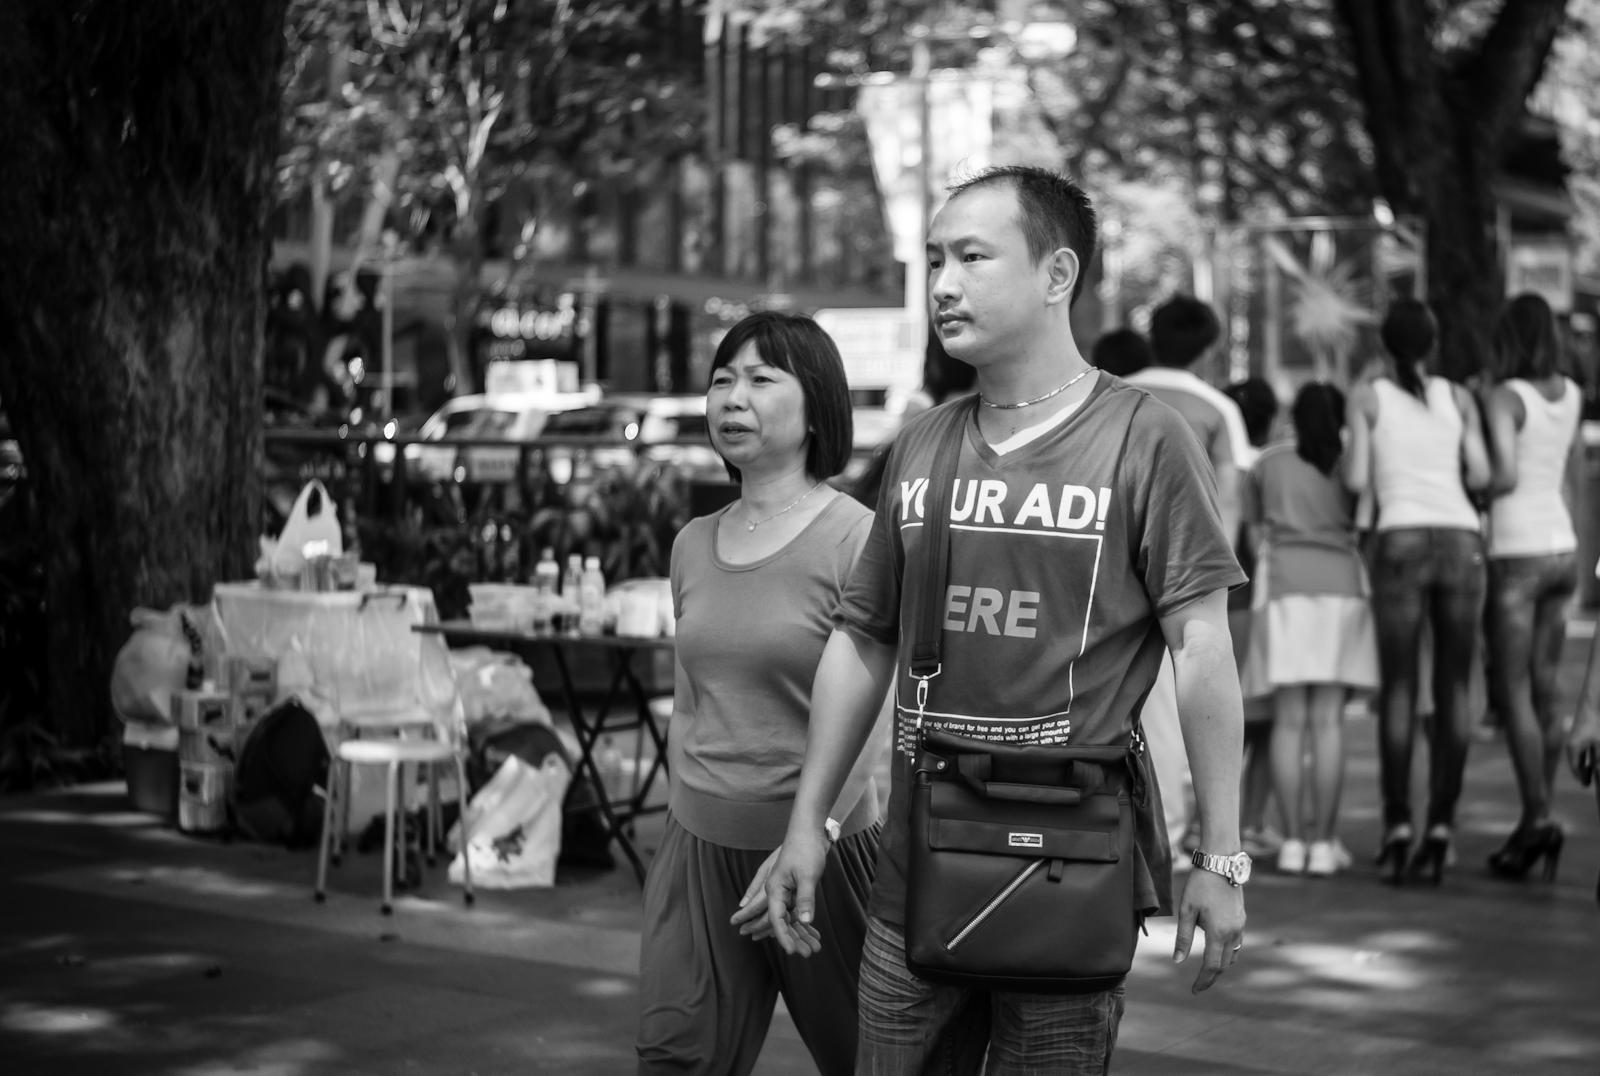 Street photography - man wearing a t-shirt that days